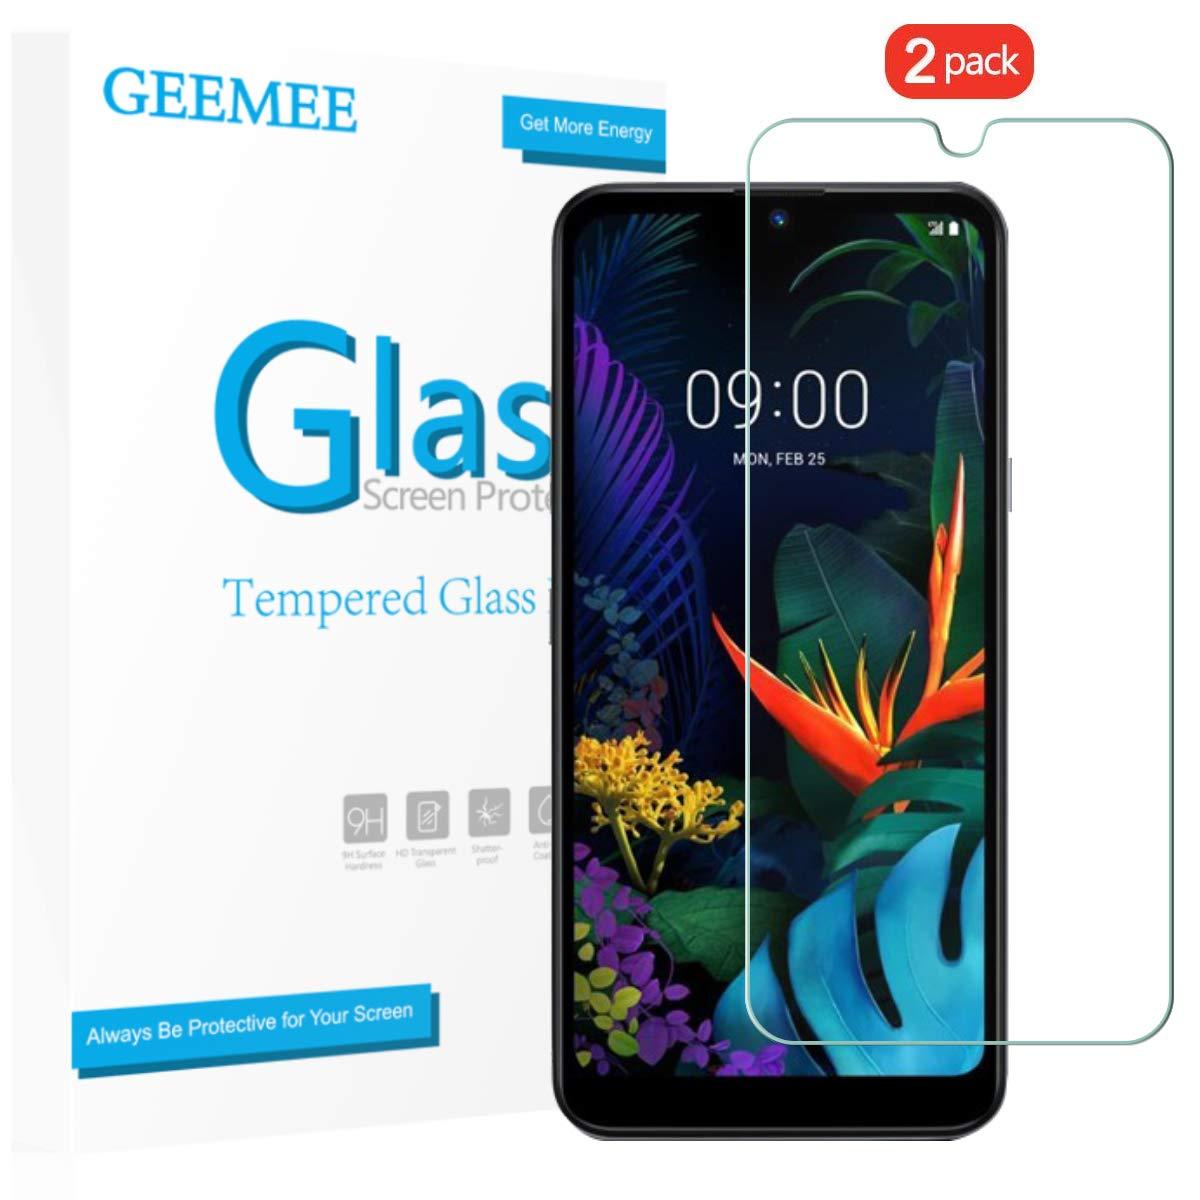 Vidrio Templado para LG Q60 GEEMEE [2 Unidades]